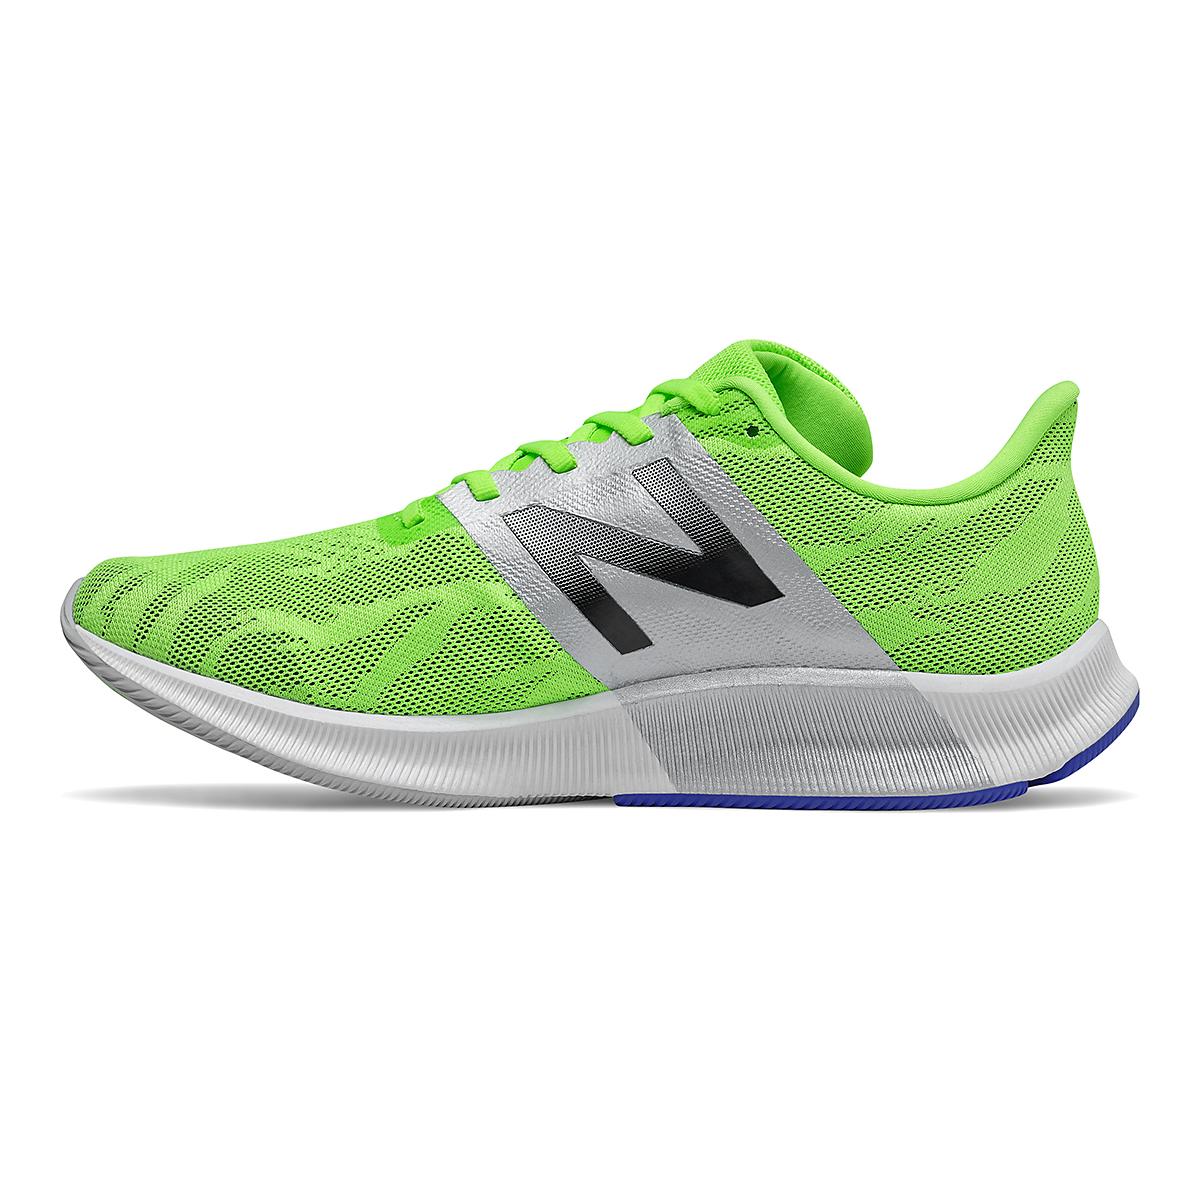 Men's New Balance 890V8 Running Shoe - Color: Energy Lime - Size: 8.5 - Width: Wide, Energy Lime, large, image 2